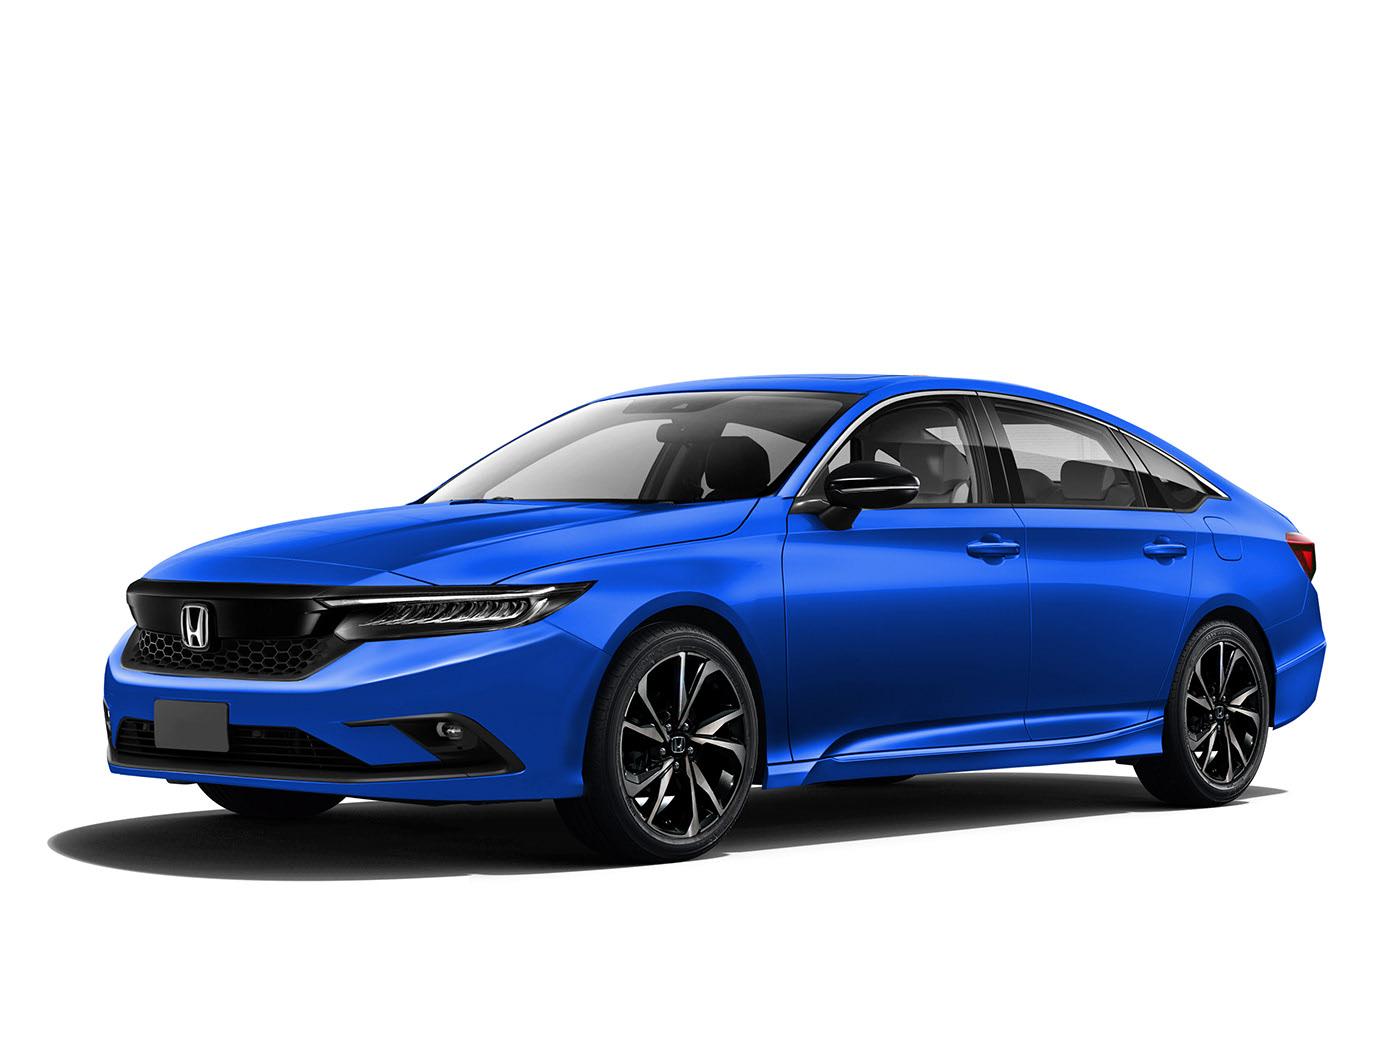 Honda S All New Civic Sedan Rendered 2022 Model Looks Grown Up Autoevolution